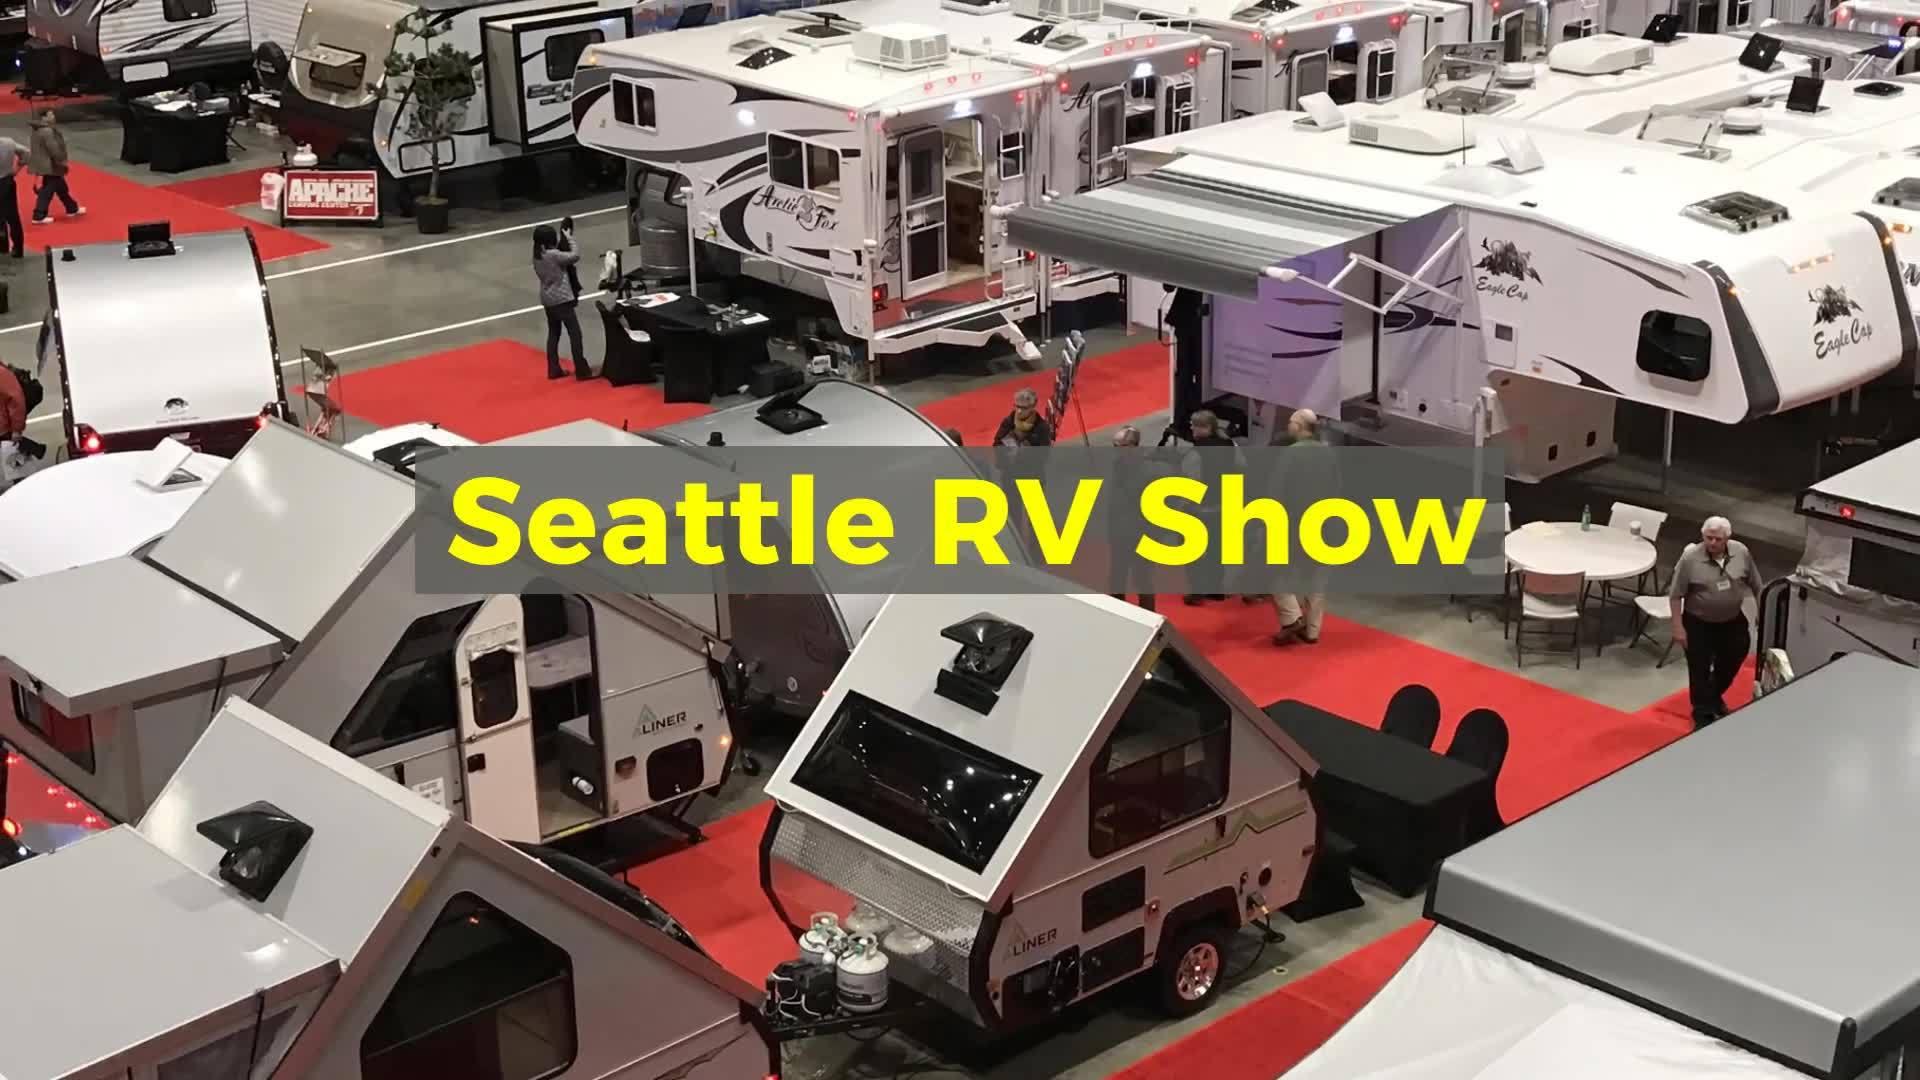 Seattle RV Show